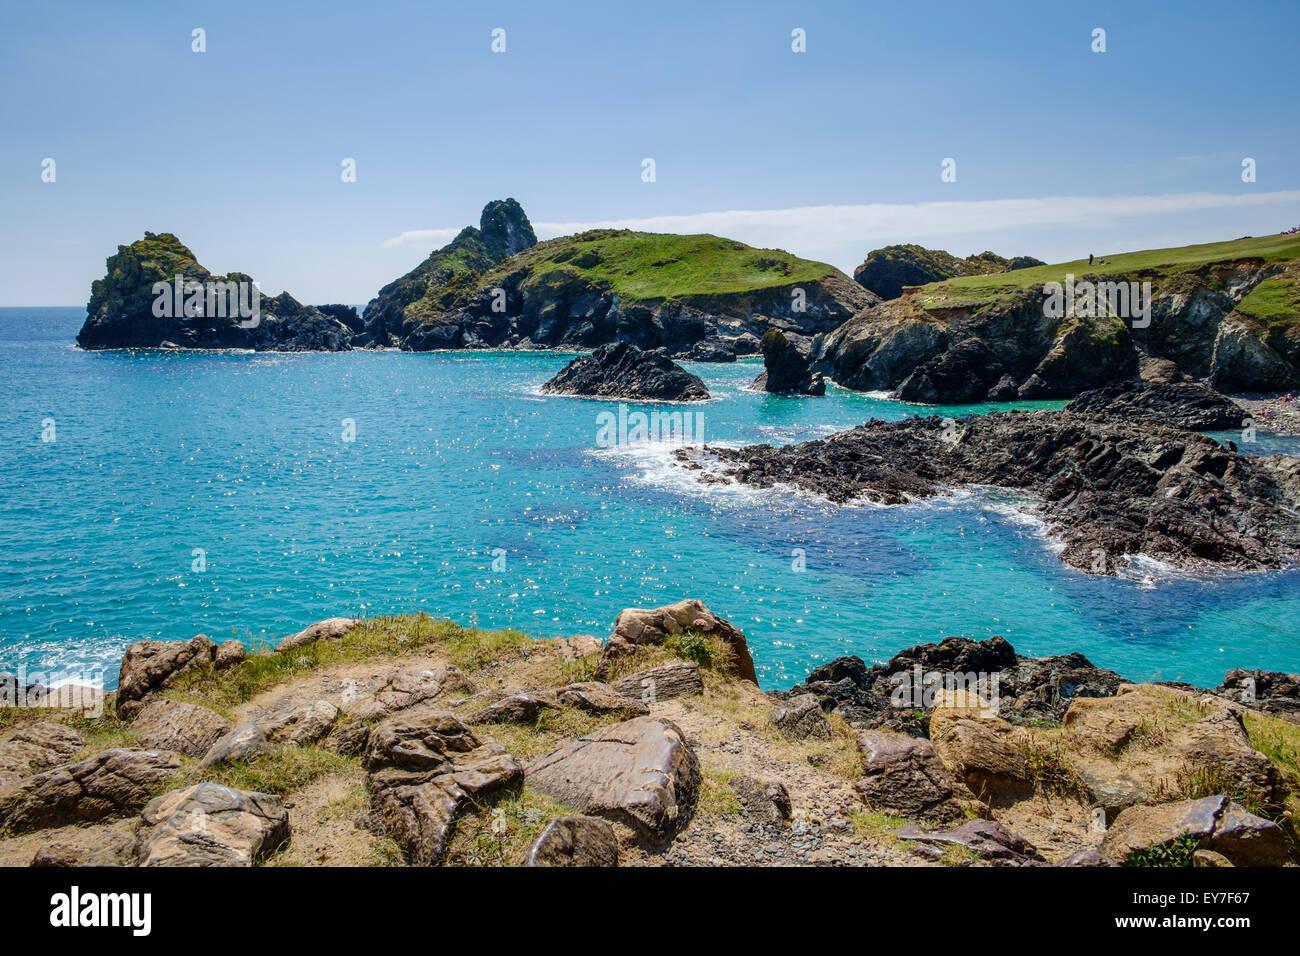 Kynance Cove, Lizard Peninsula, Cornwall, England, UK at high tide - Stock Image